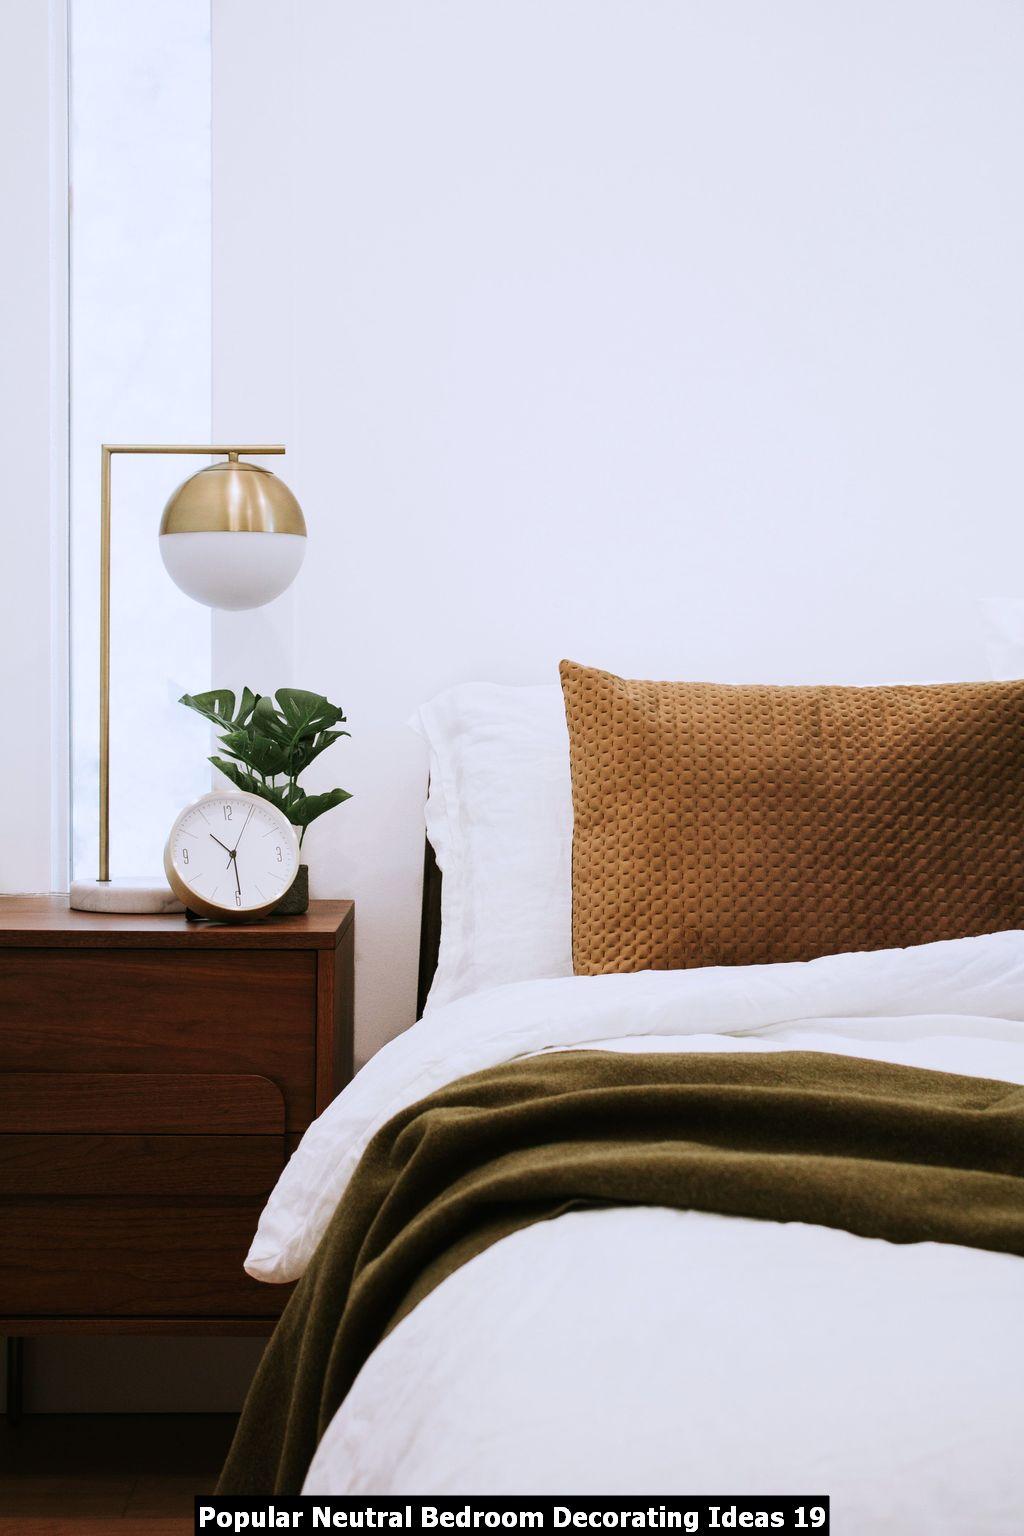 Popular Neutral Bedroom Decorating Ideas 19